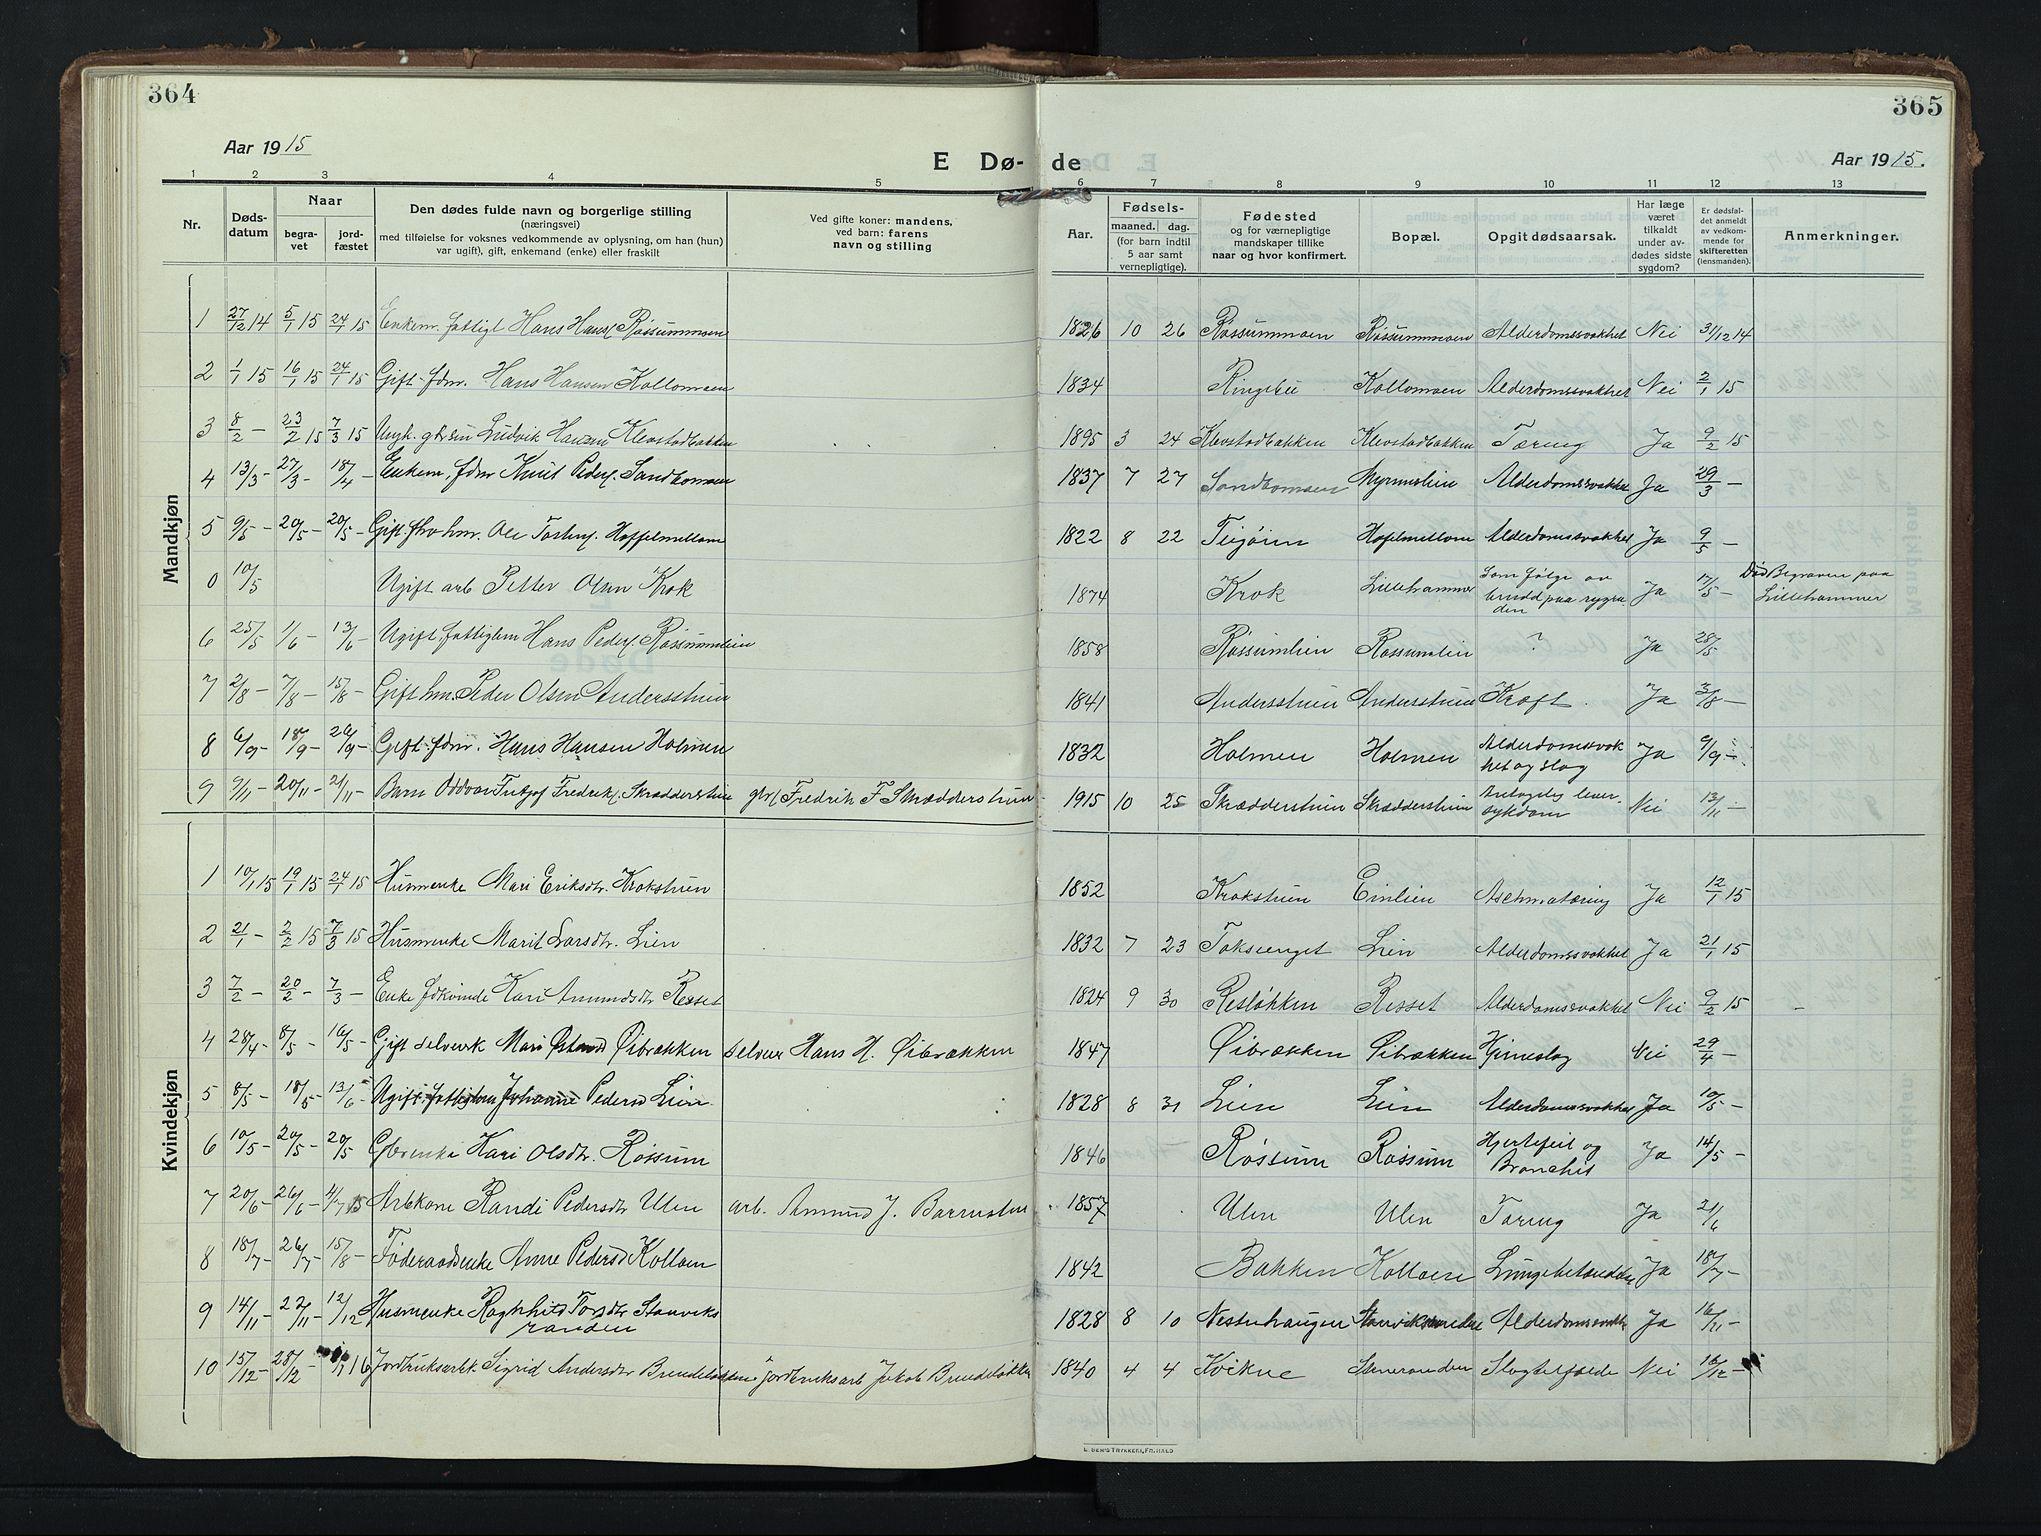 SAH, Nord-Fron prestekontor, Klokkerbok nr. 8, 1915-1948, s. 364-365